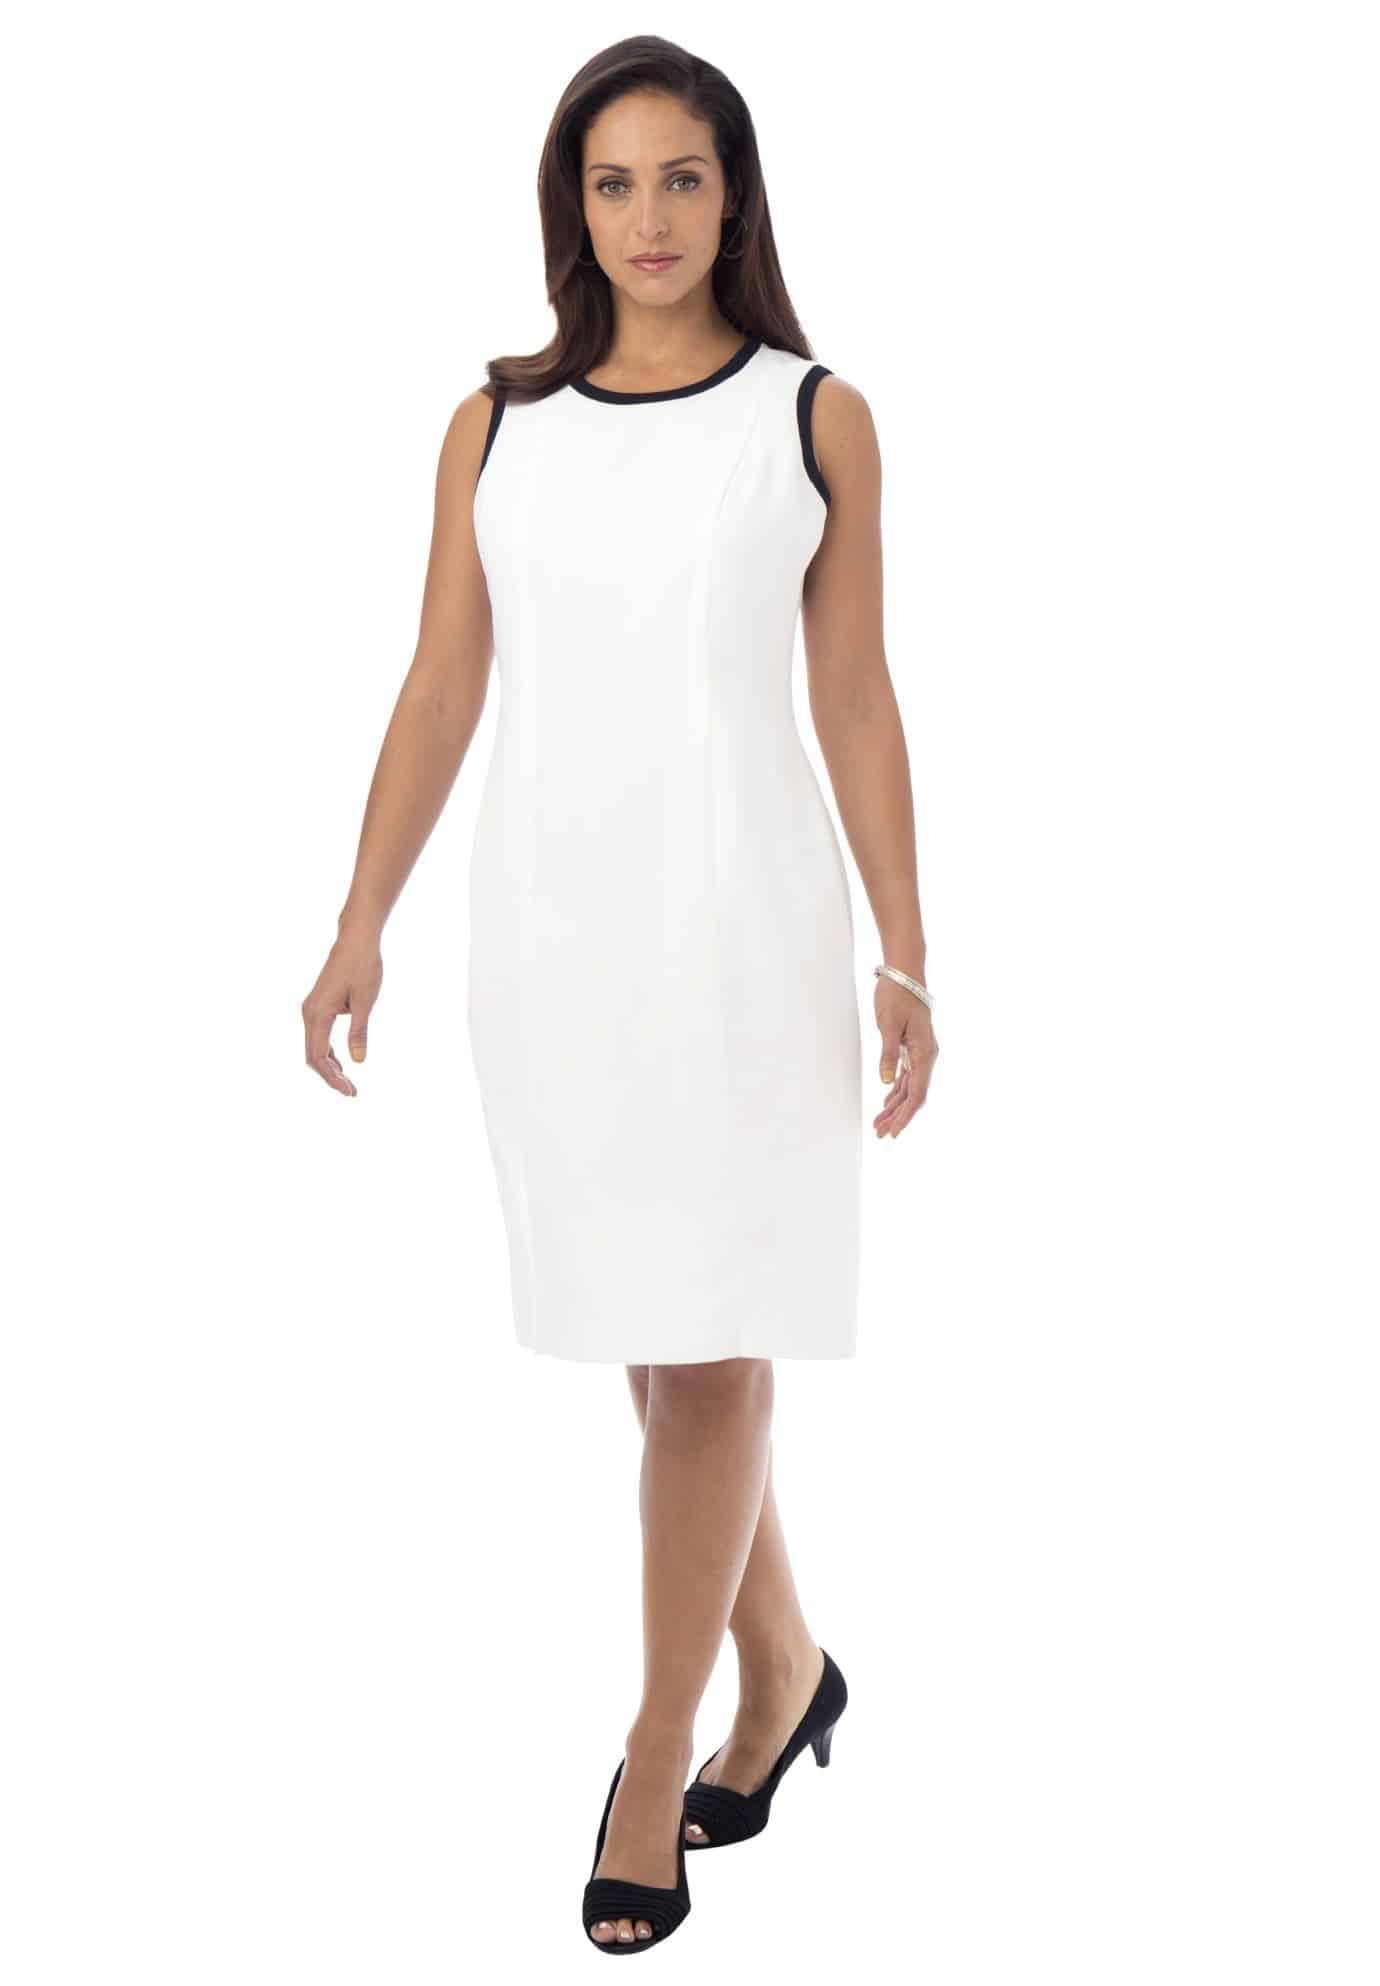 classic sheath dress for work